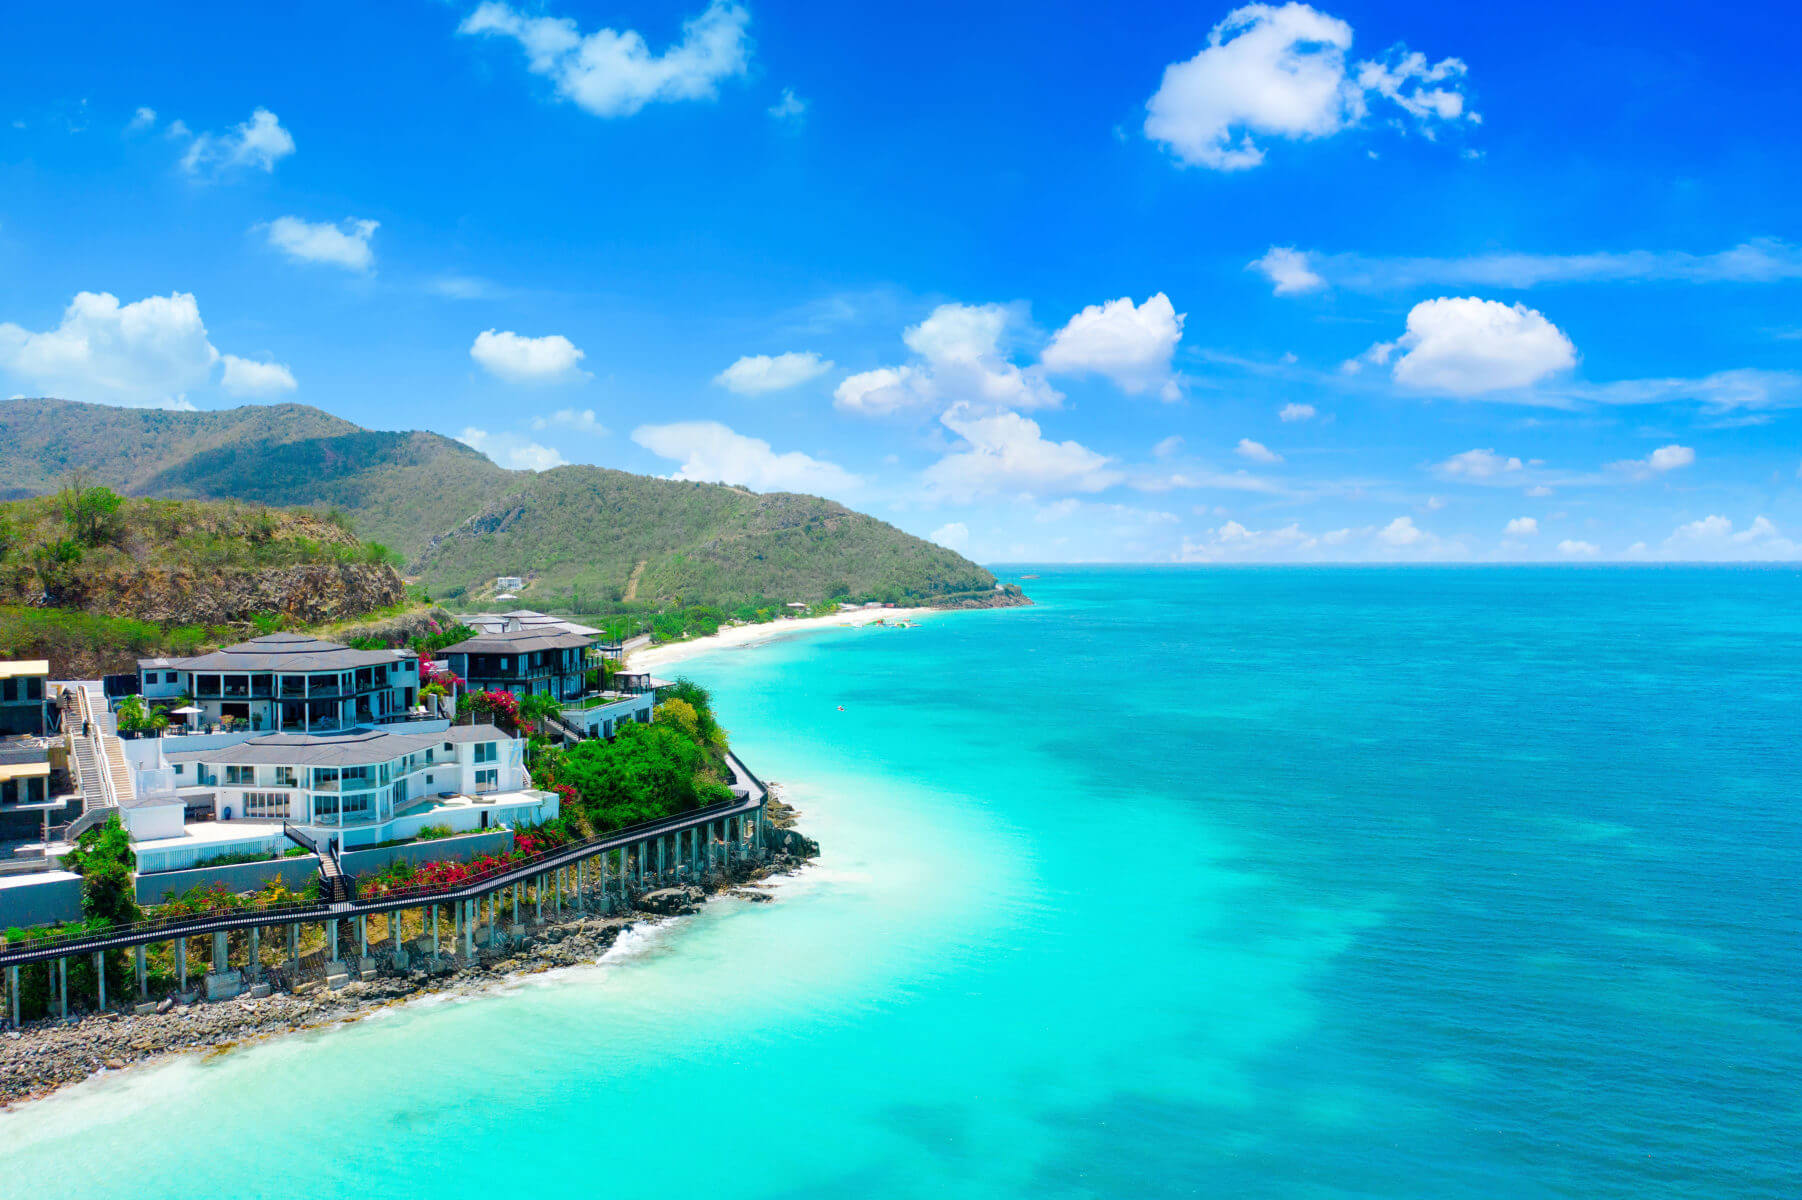 Visit Antigua & Barbuda - The heart of the Carribean